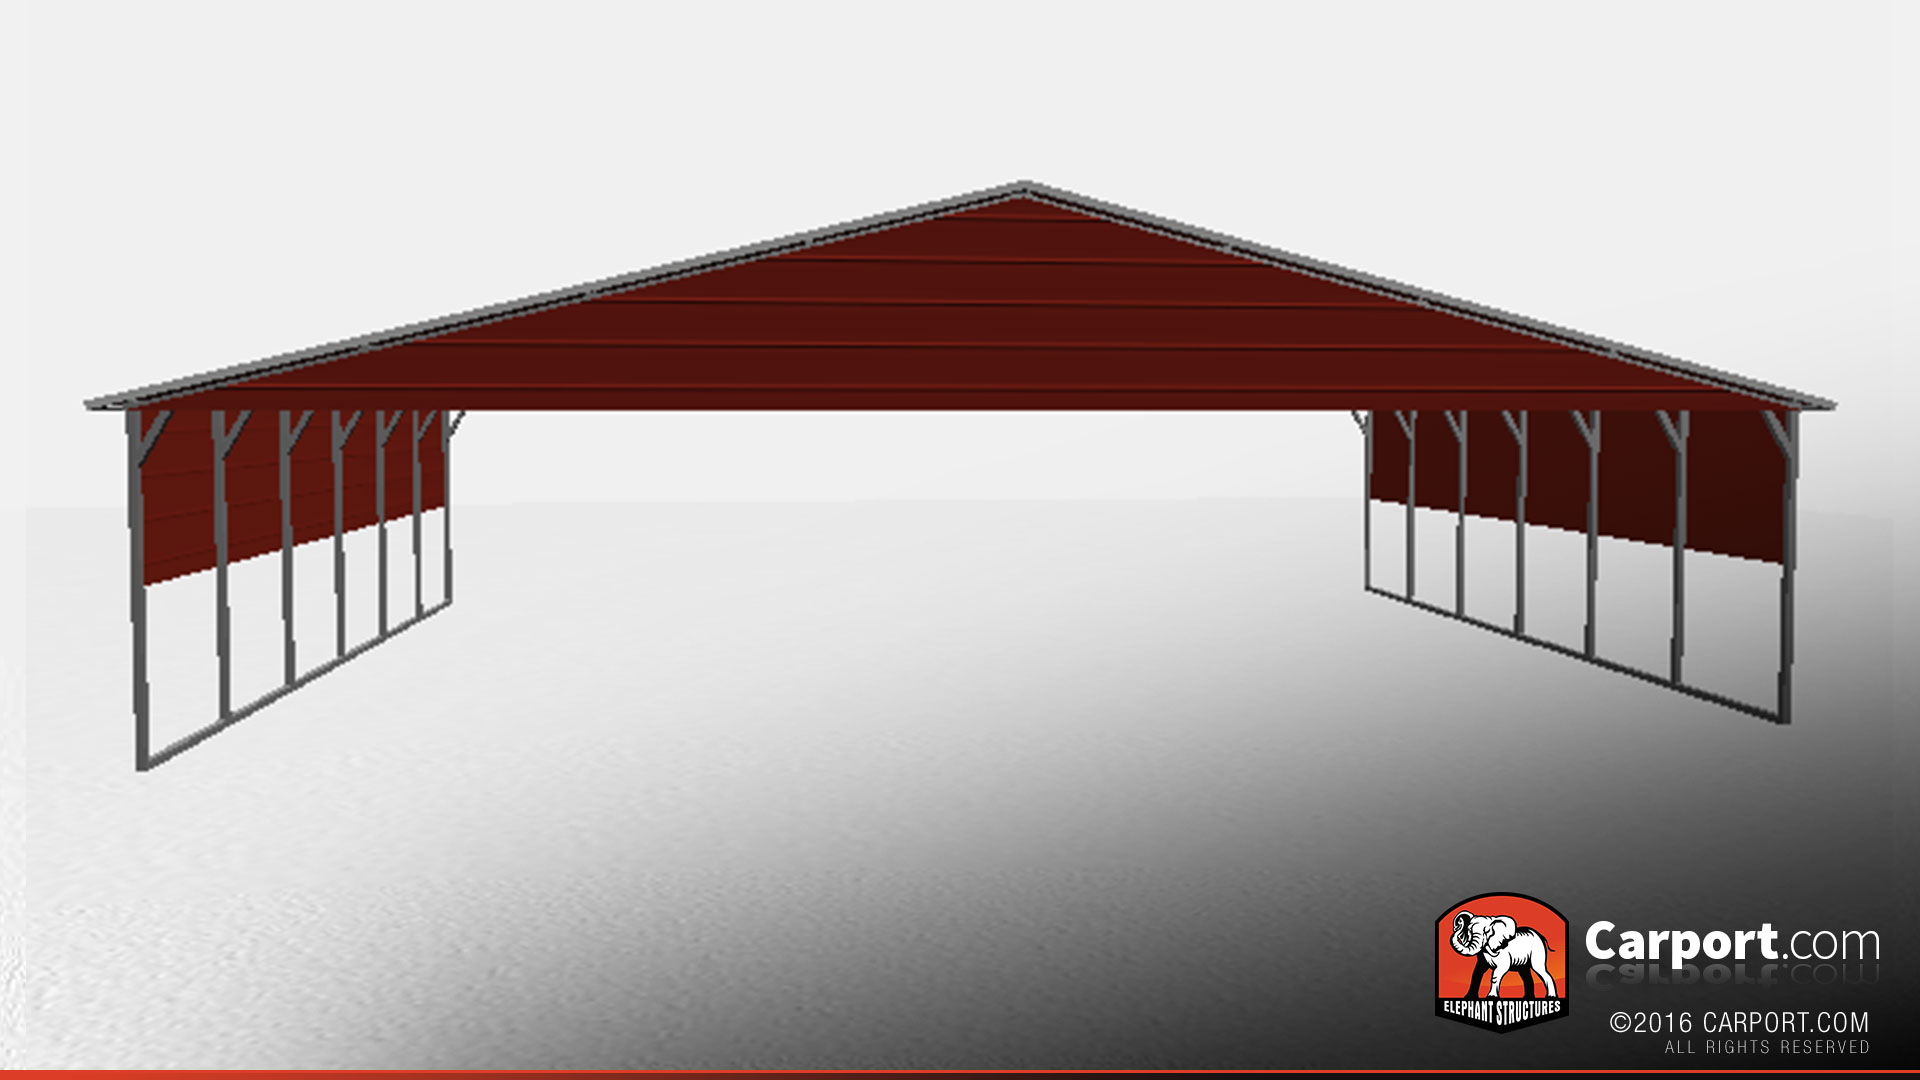 Metal Carport Roof Panels : Vertical roof metal carport with side panels